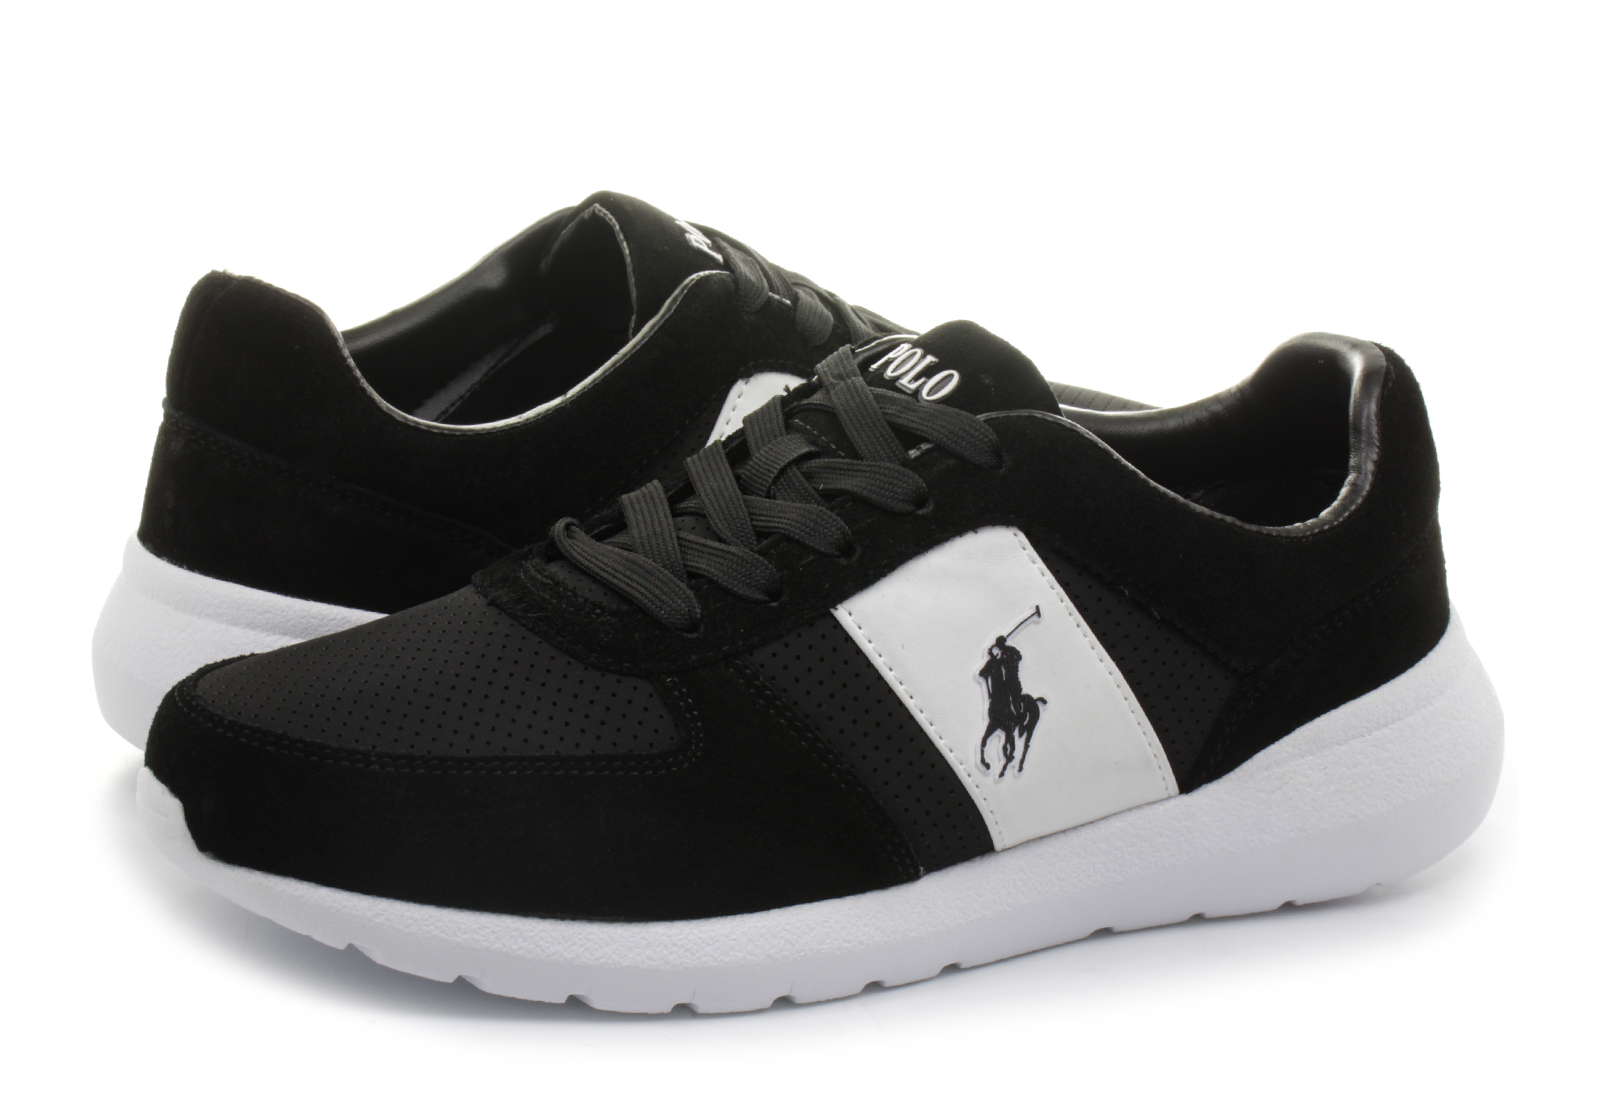 Polo Ralph Lauren Cipő - Cordell - 816664690001 - Office Shoes ... 1909b61610